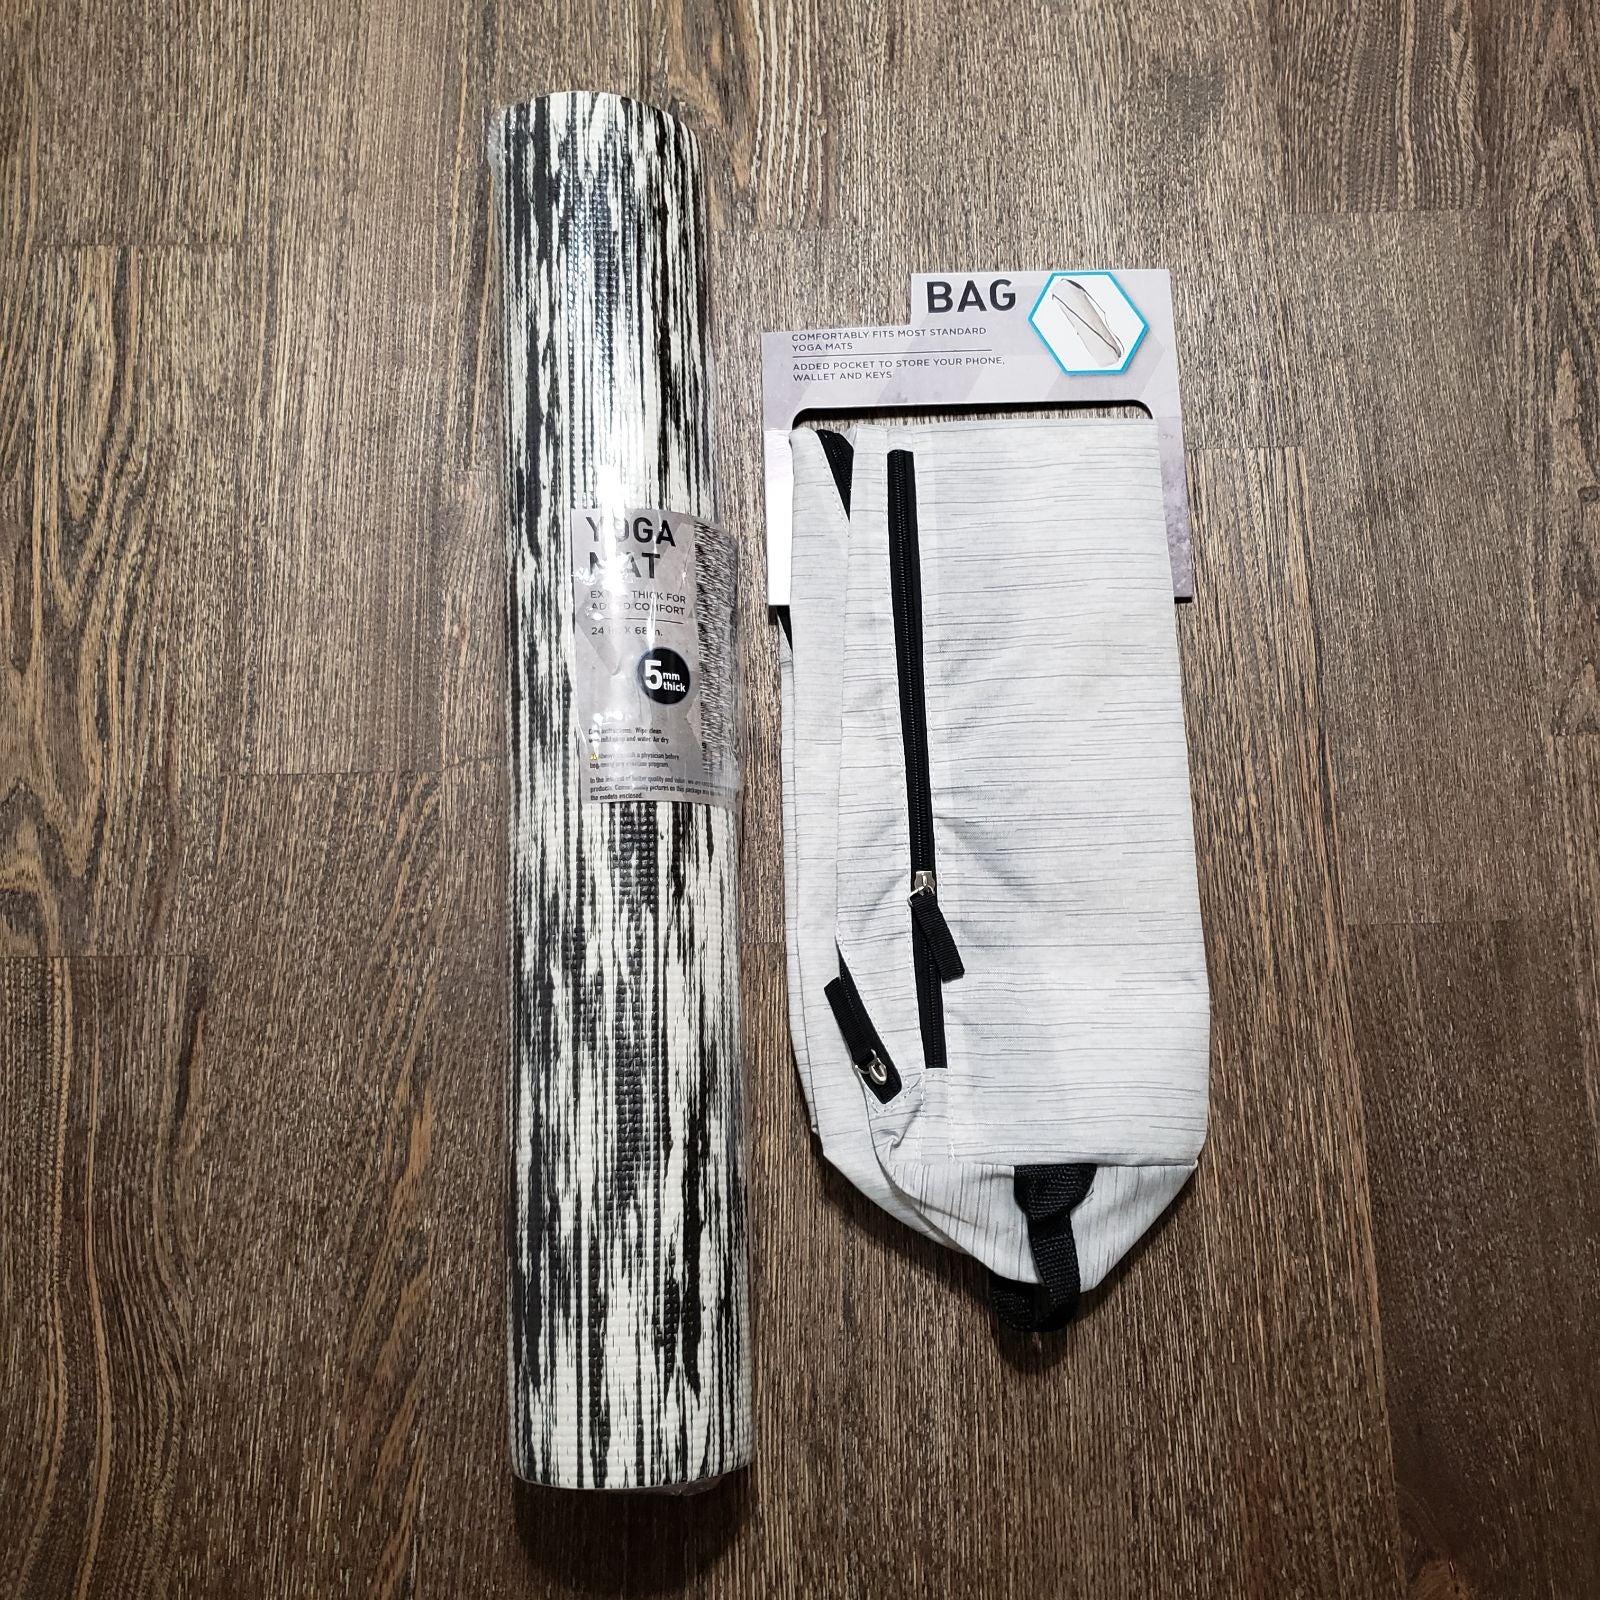 Yoga mat